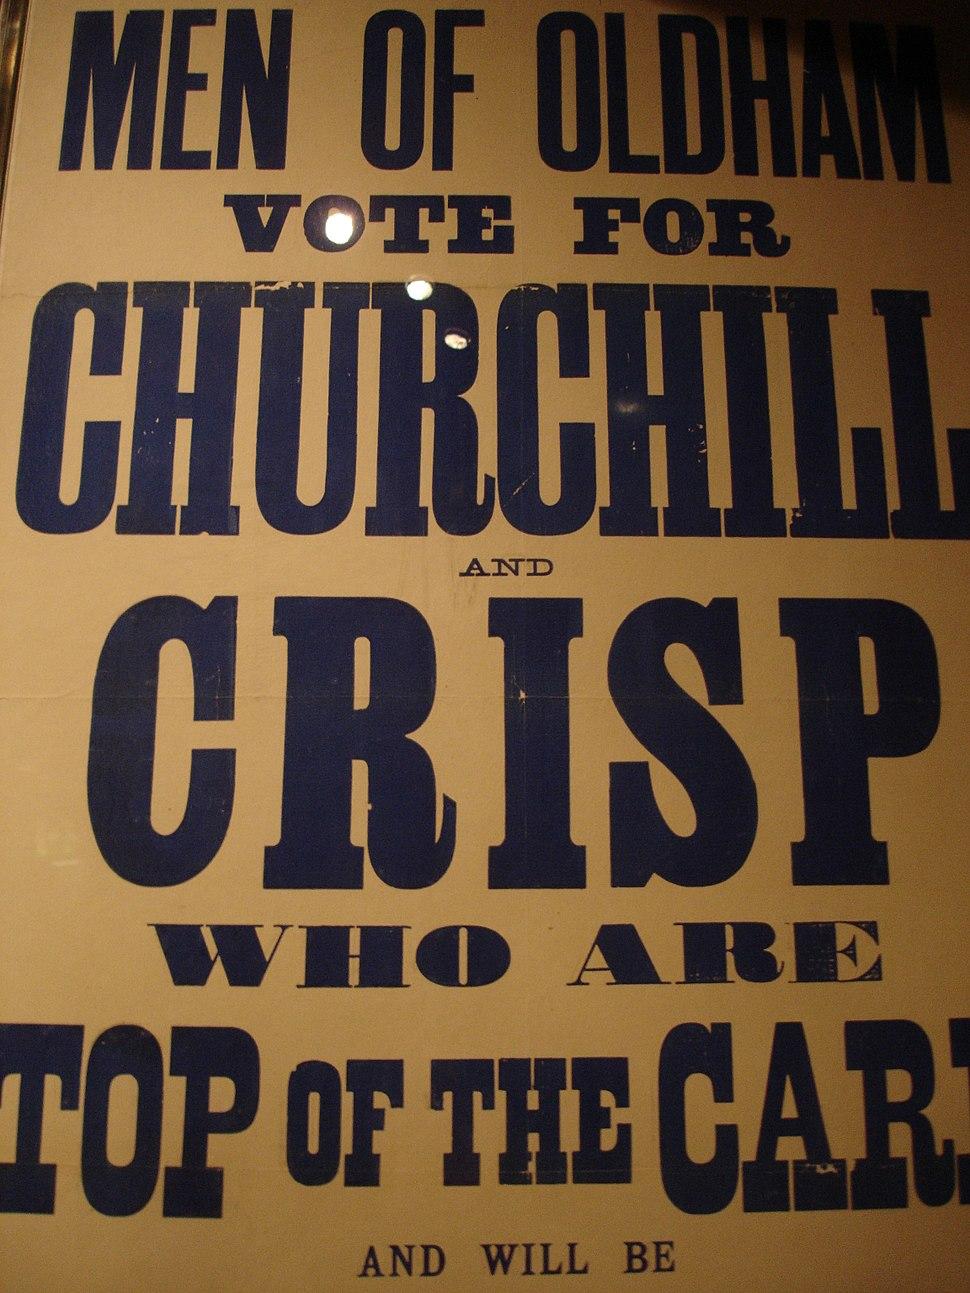 Churchillelectionposteroldham